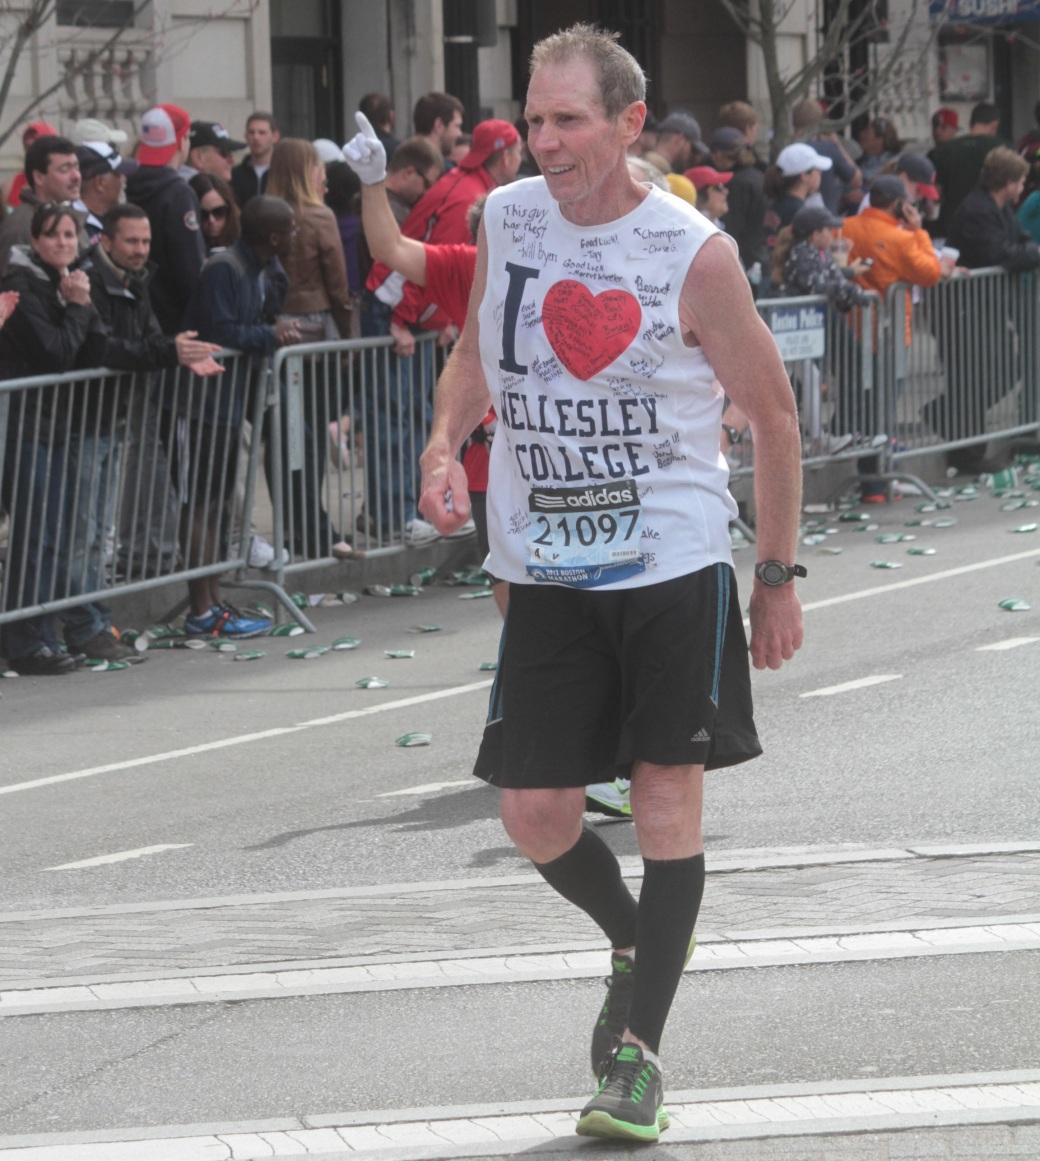 boston marathon 2013 number 21097